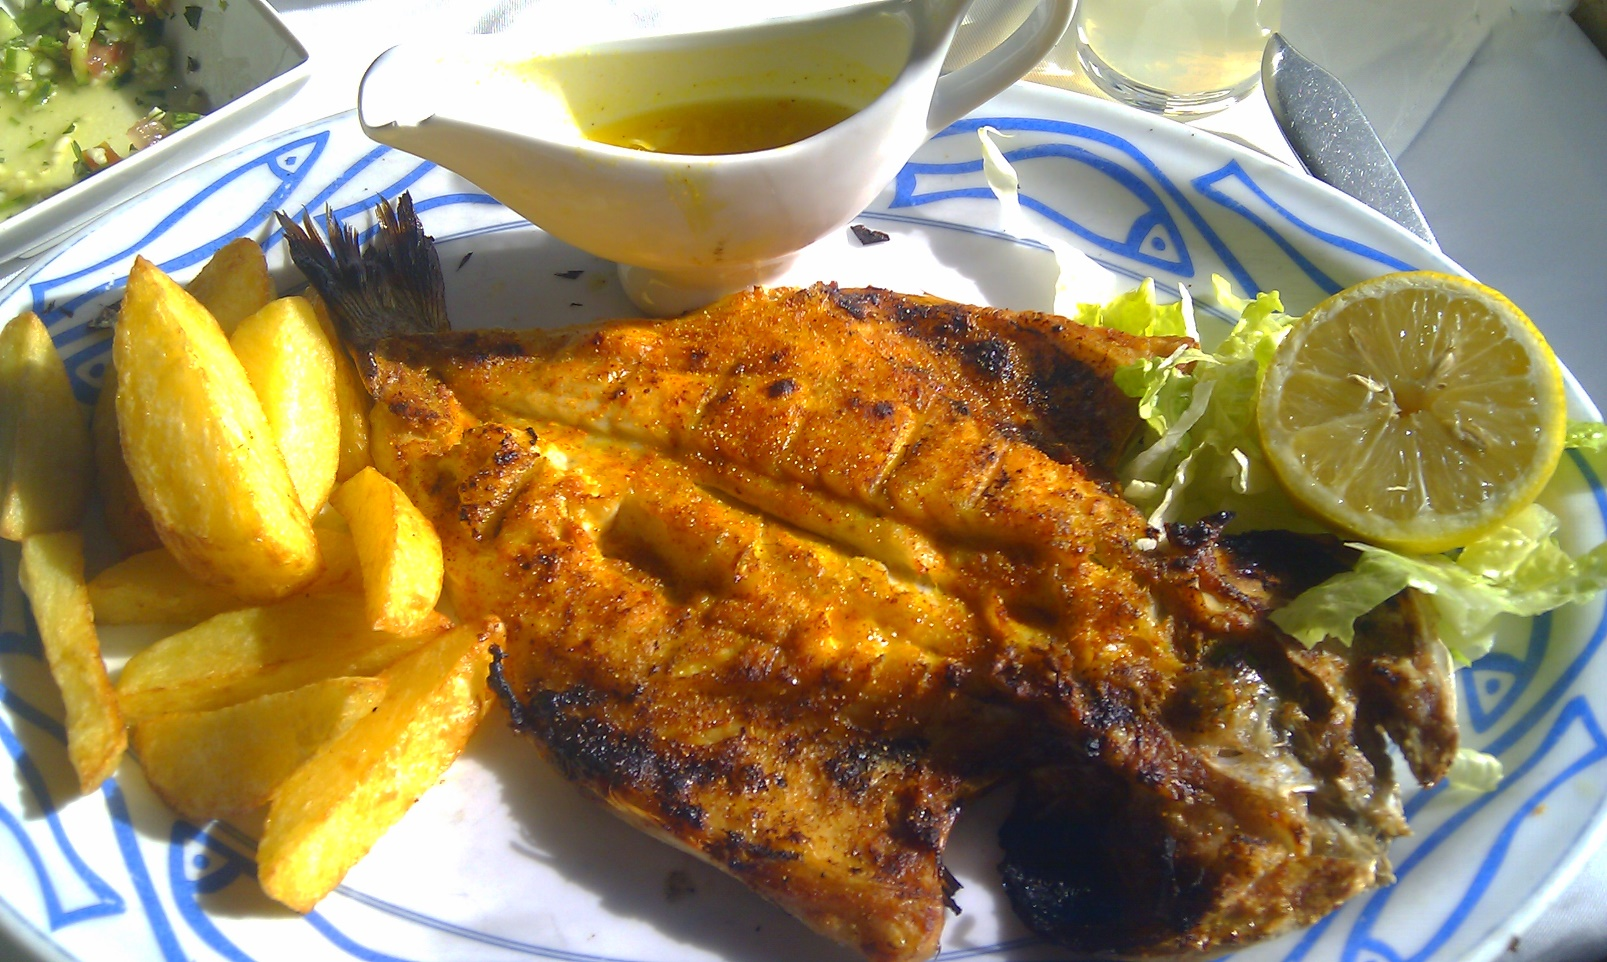 Sea bream served at Ahavat Hayam in Jerusalem. Photo courtesy of the Tasted Israel blog